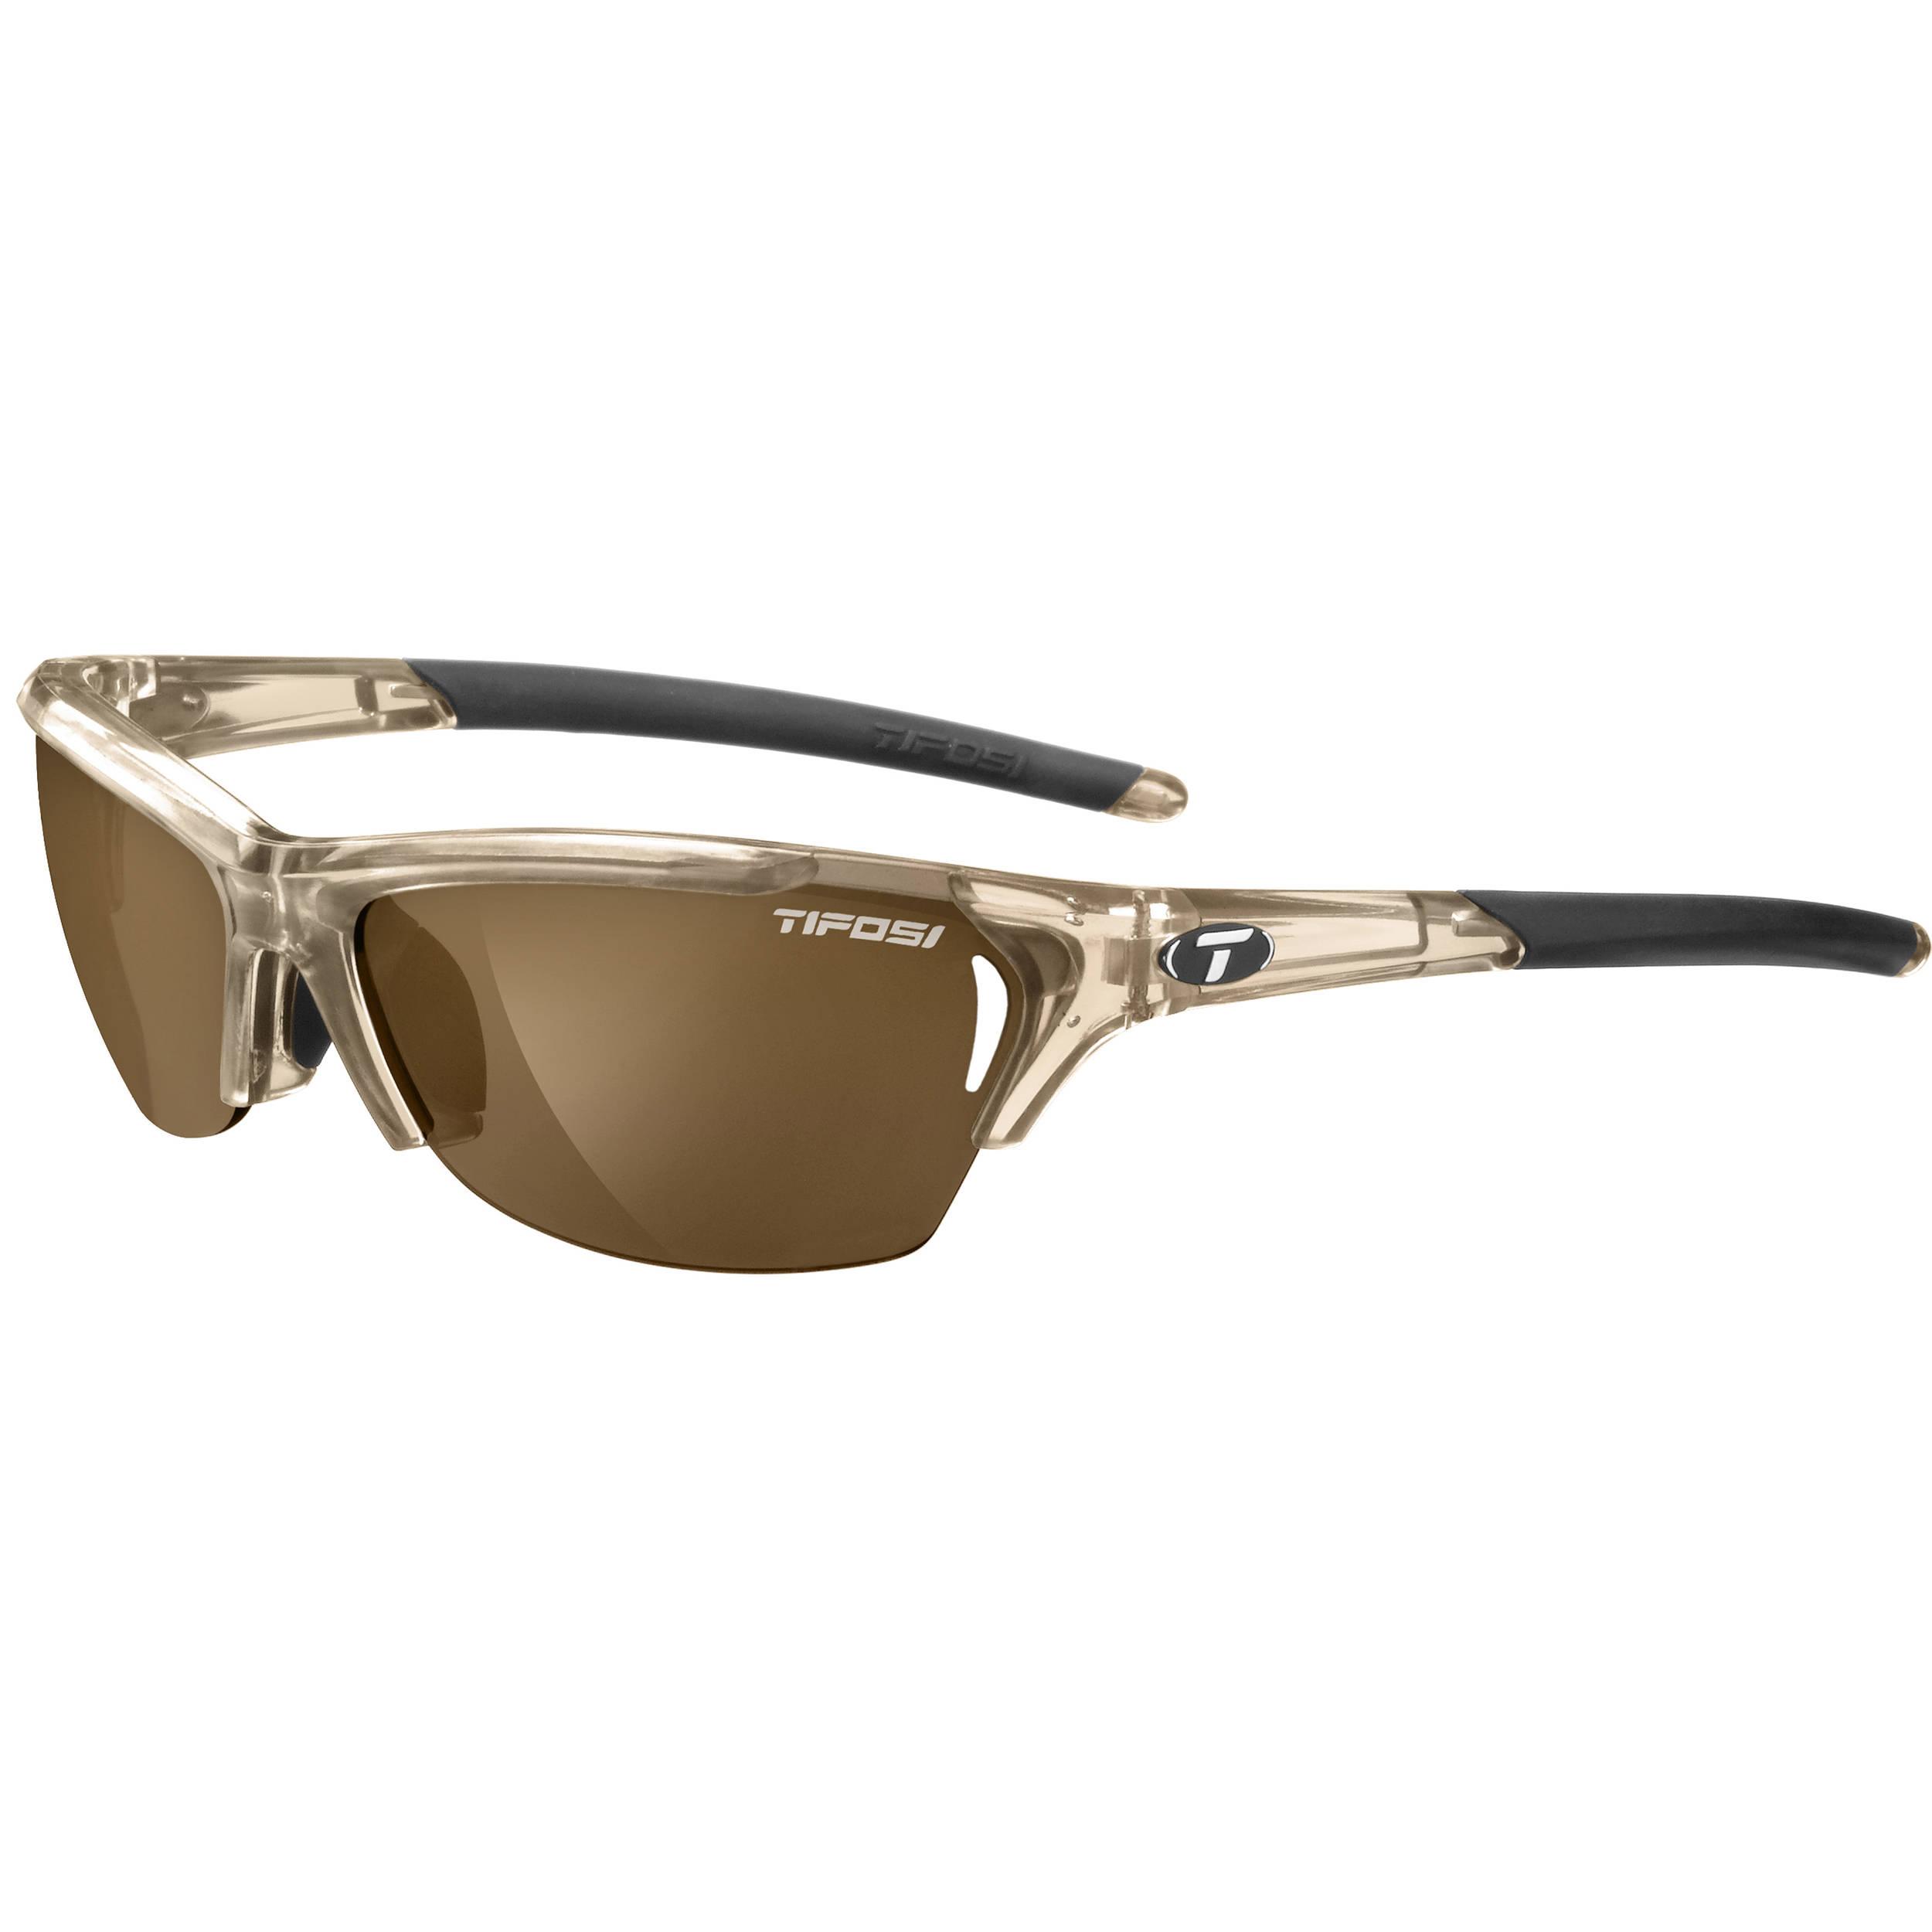 7080f45f01 Tifosi Radius Sunglasses (Crystal Brown Frames Brown Polarized Fototec  Lenses)